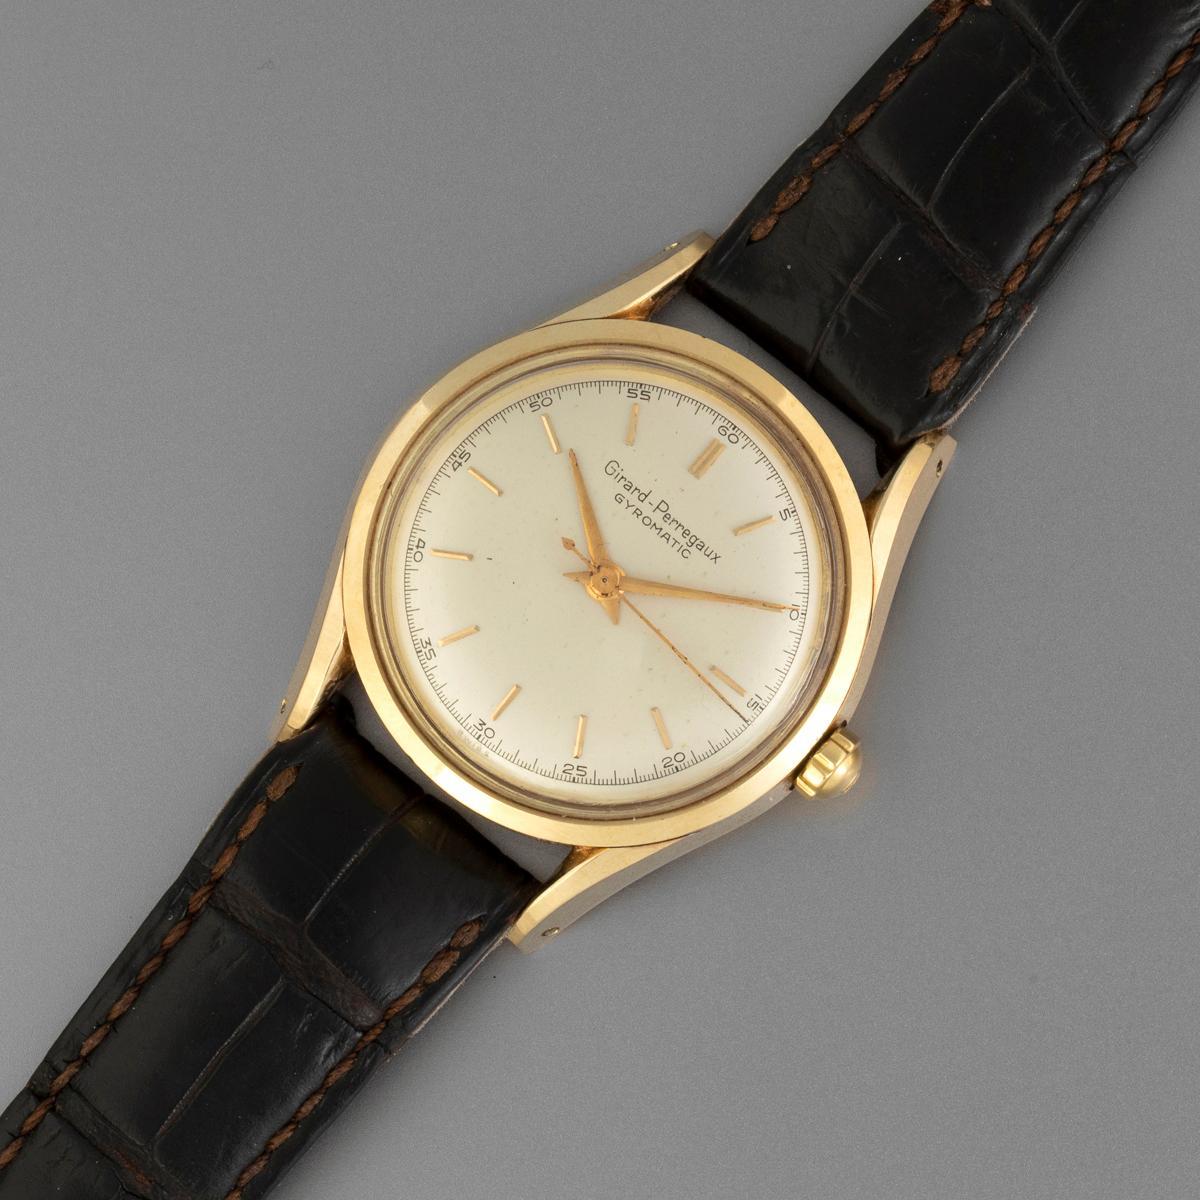 Girard Perregaux Gyromatic Gold Automatic Wristwatch